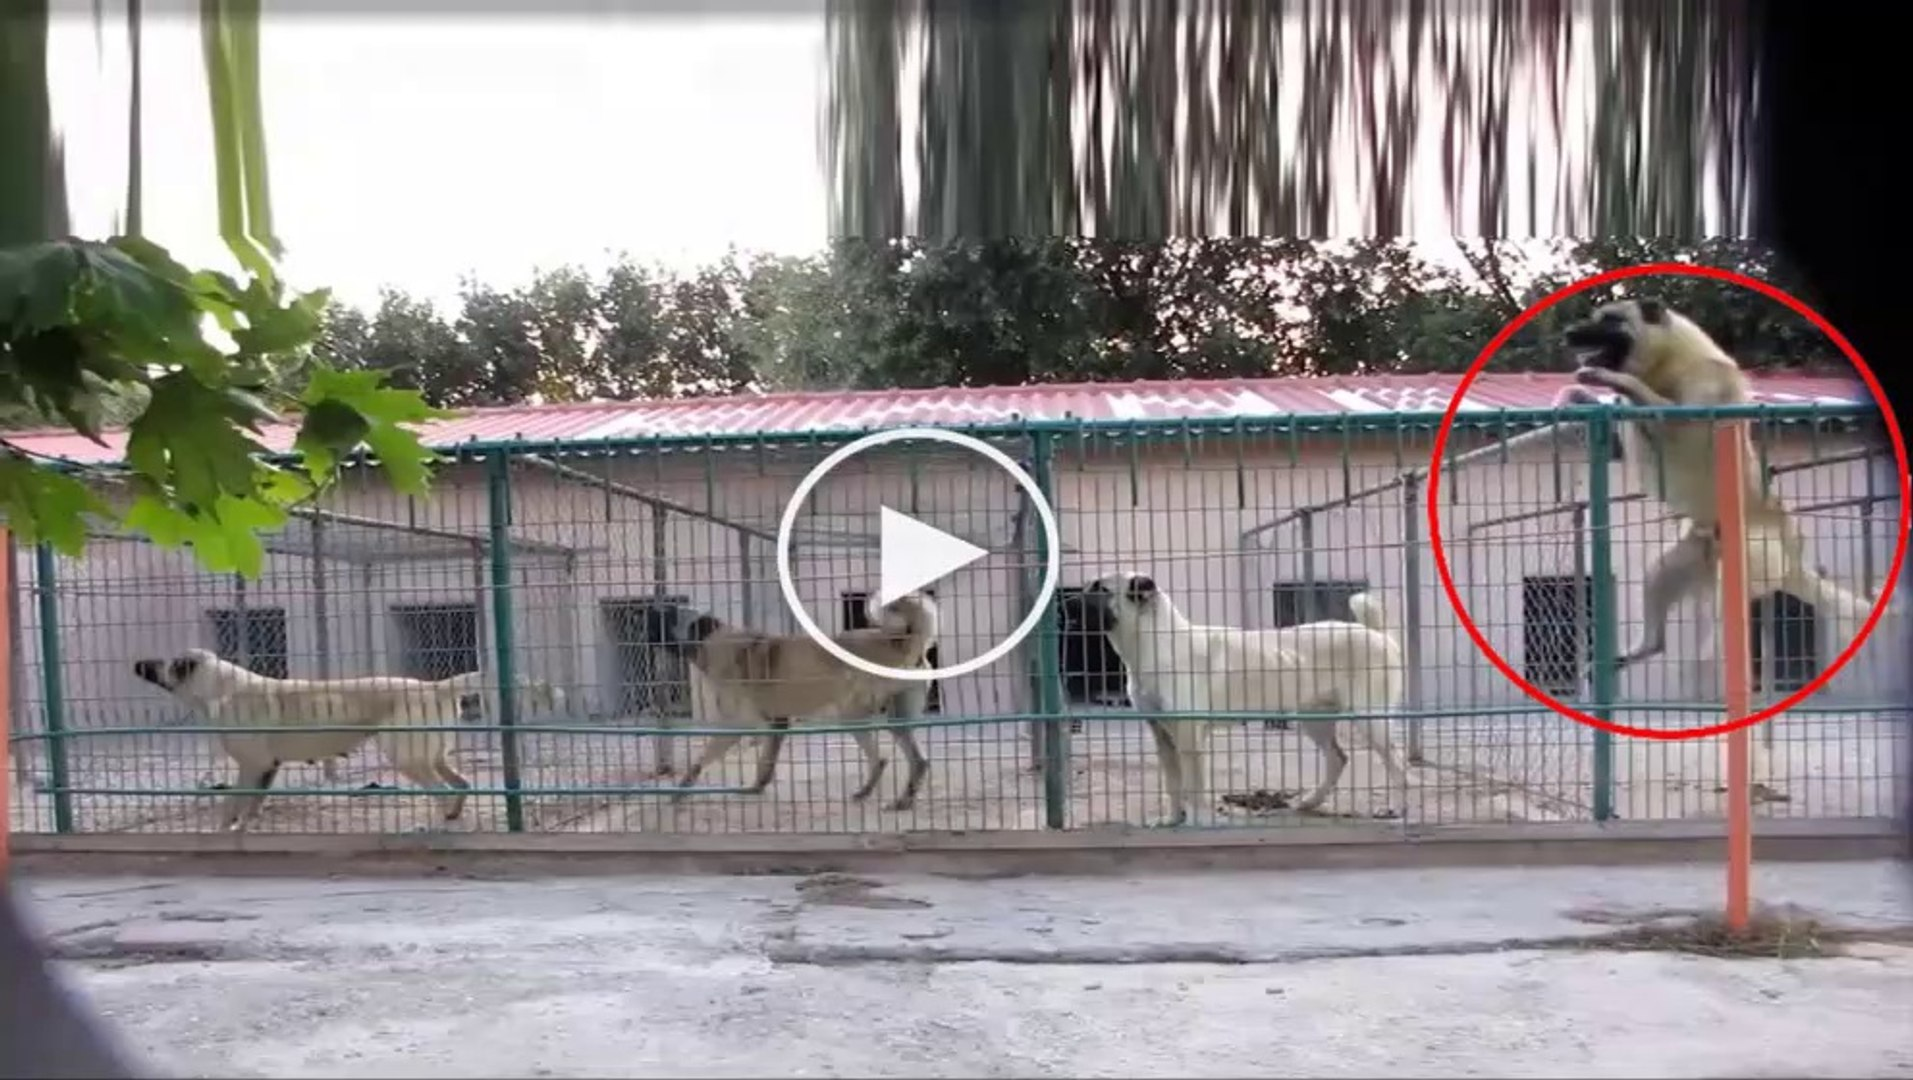 DiZi DiZi SiVAS KANGAL KOPEKLERi - ANATOLiAN SHEPHERD SiVAS KANGAL DOG